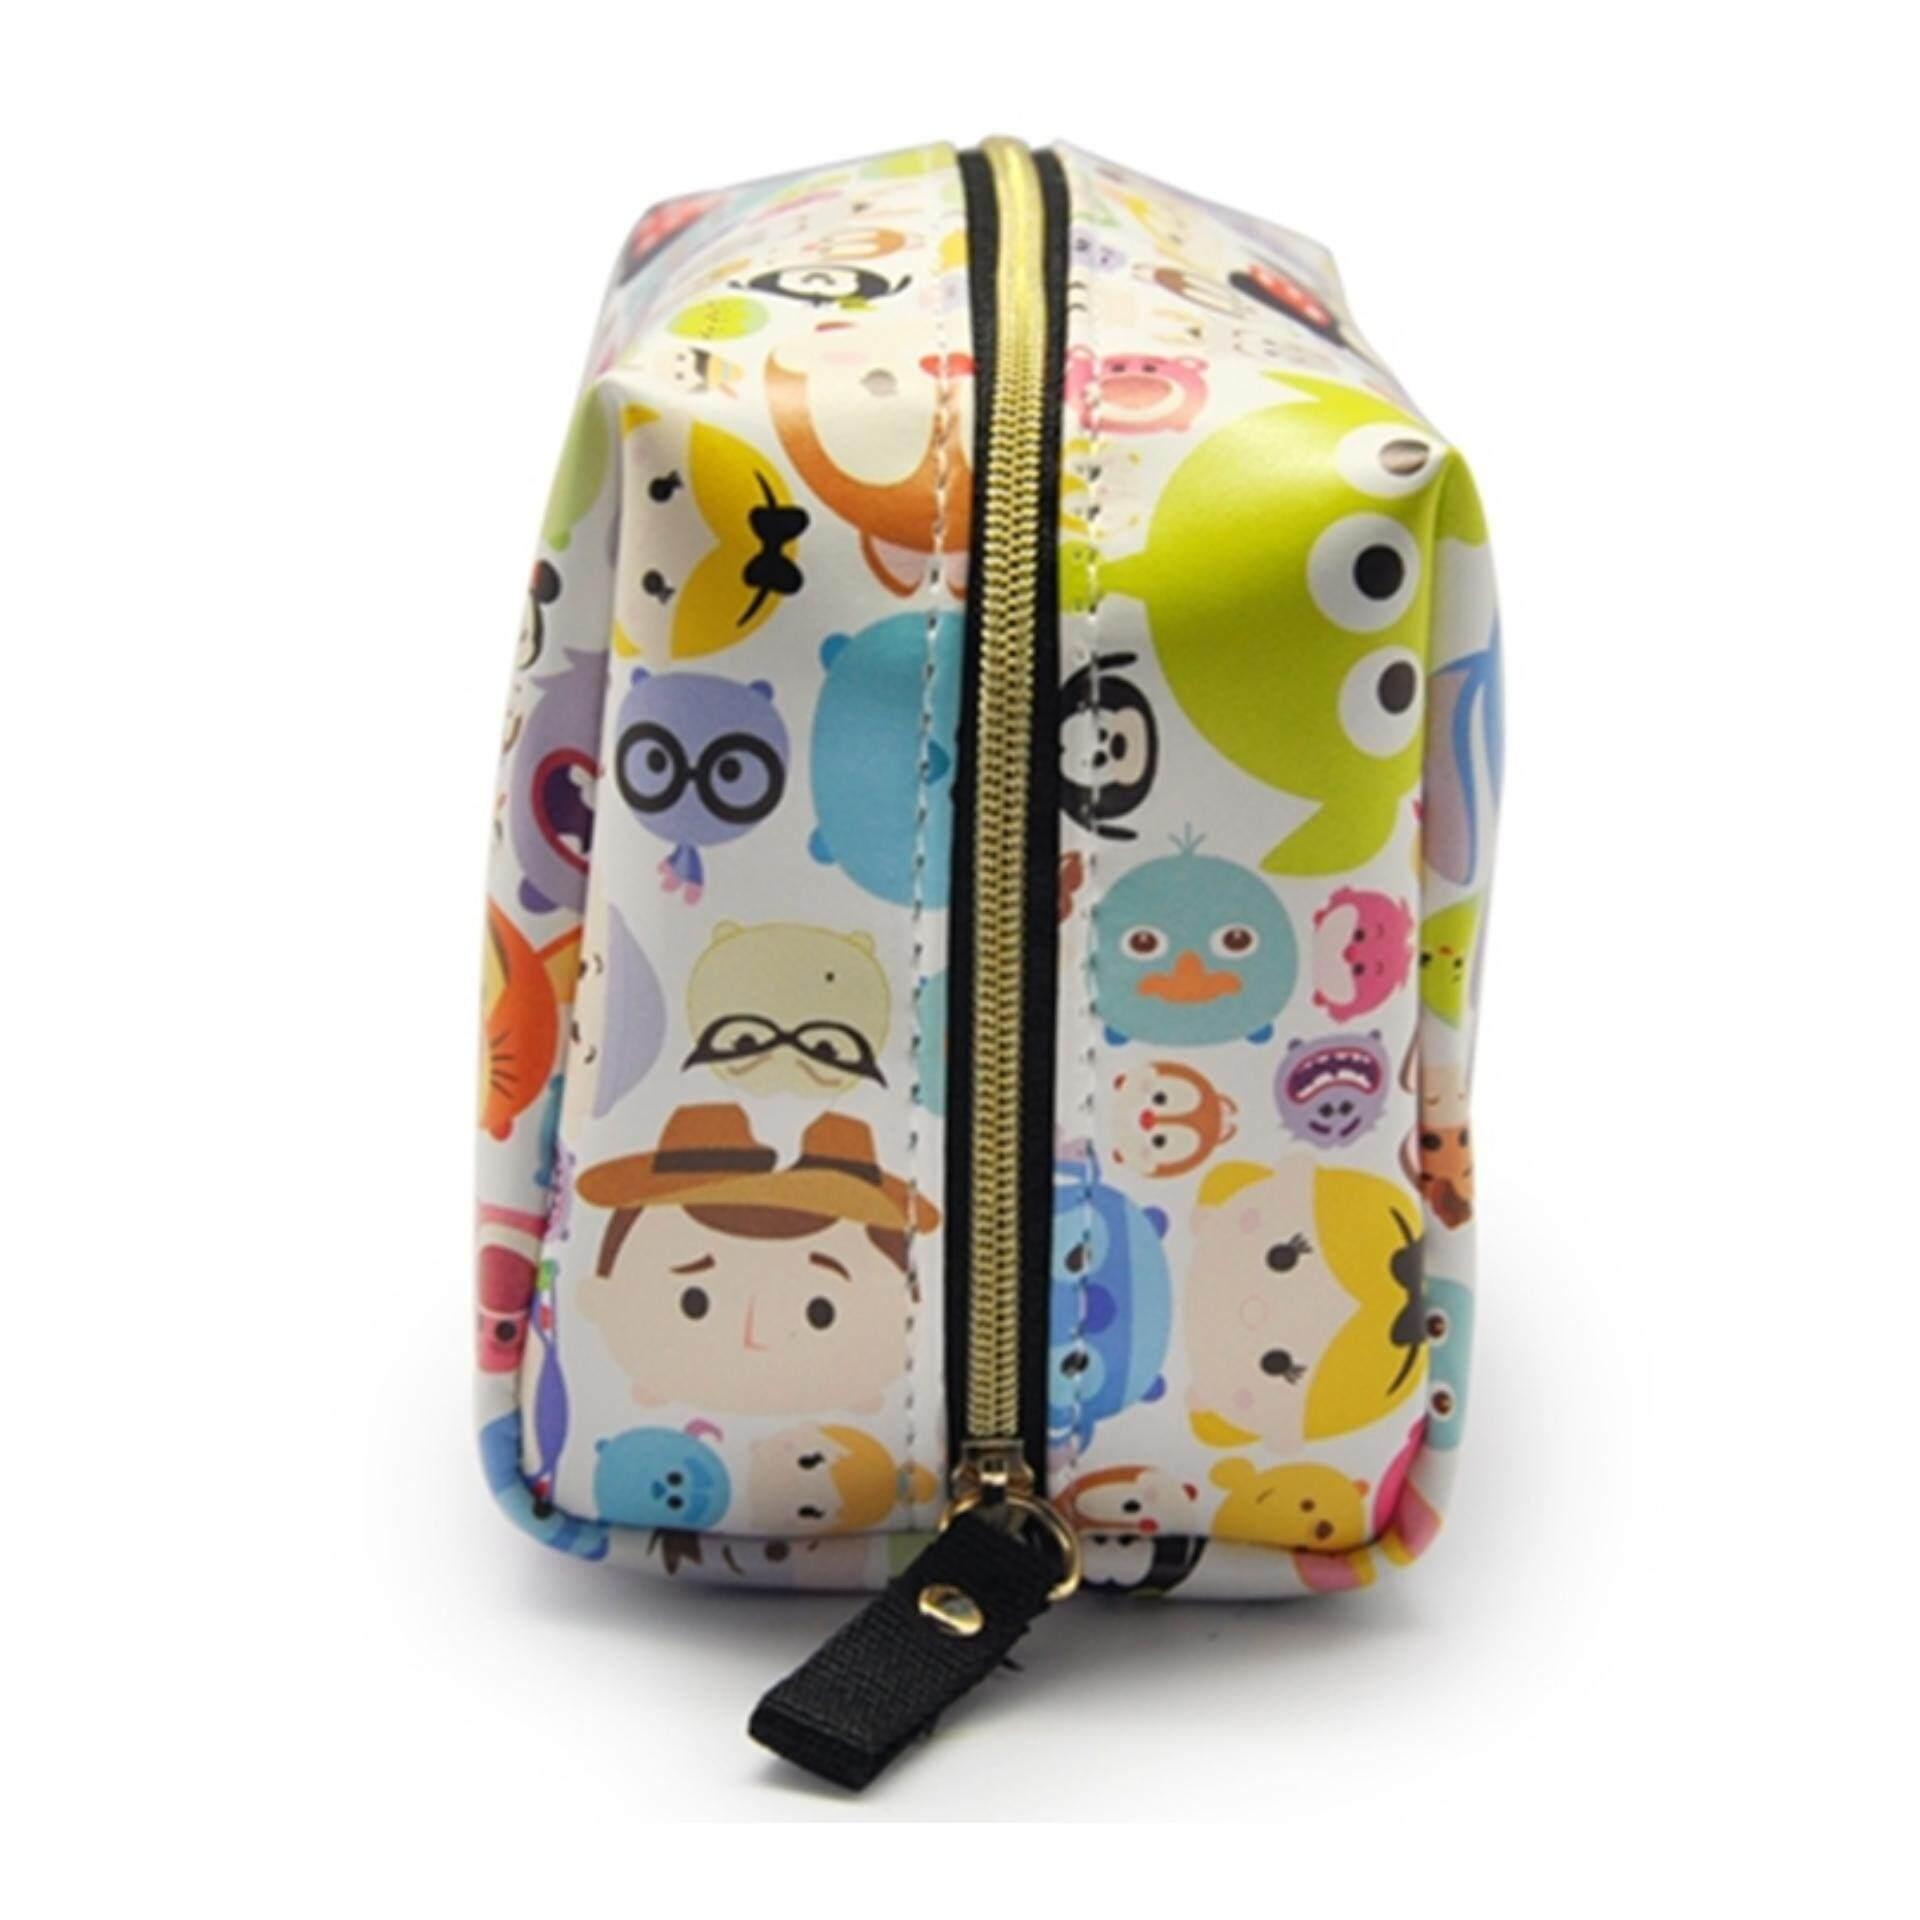 Disney Tsum Tsum Square Pouch Bag - White Colour